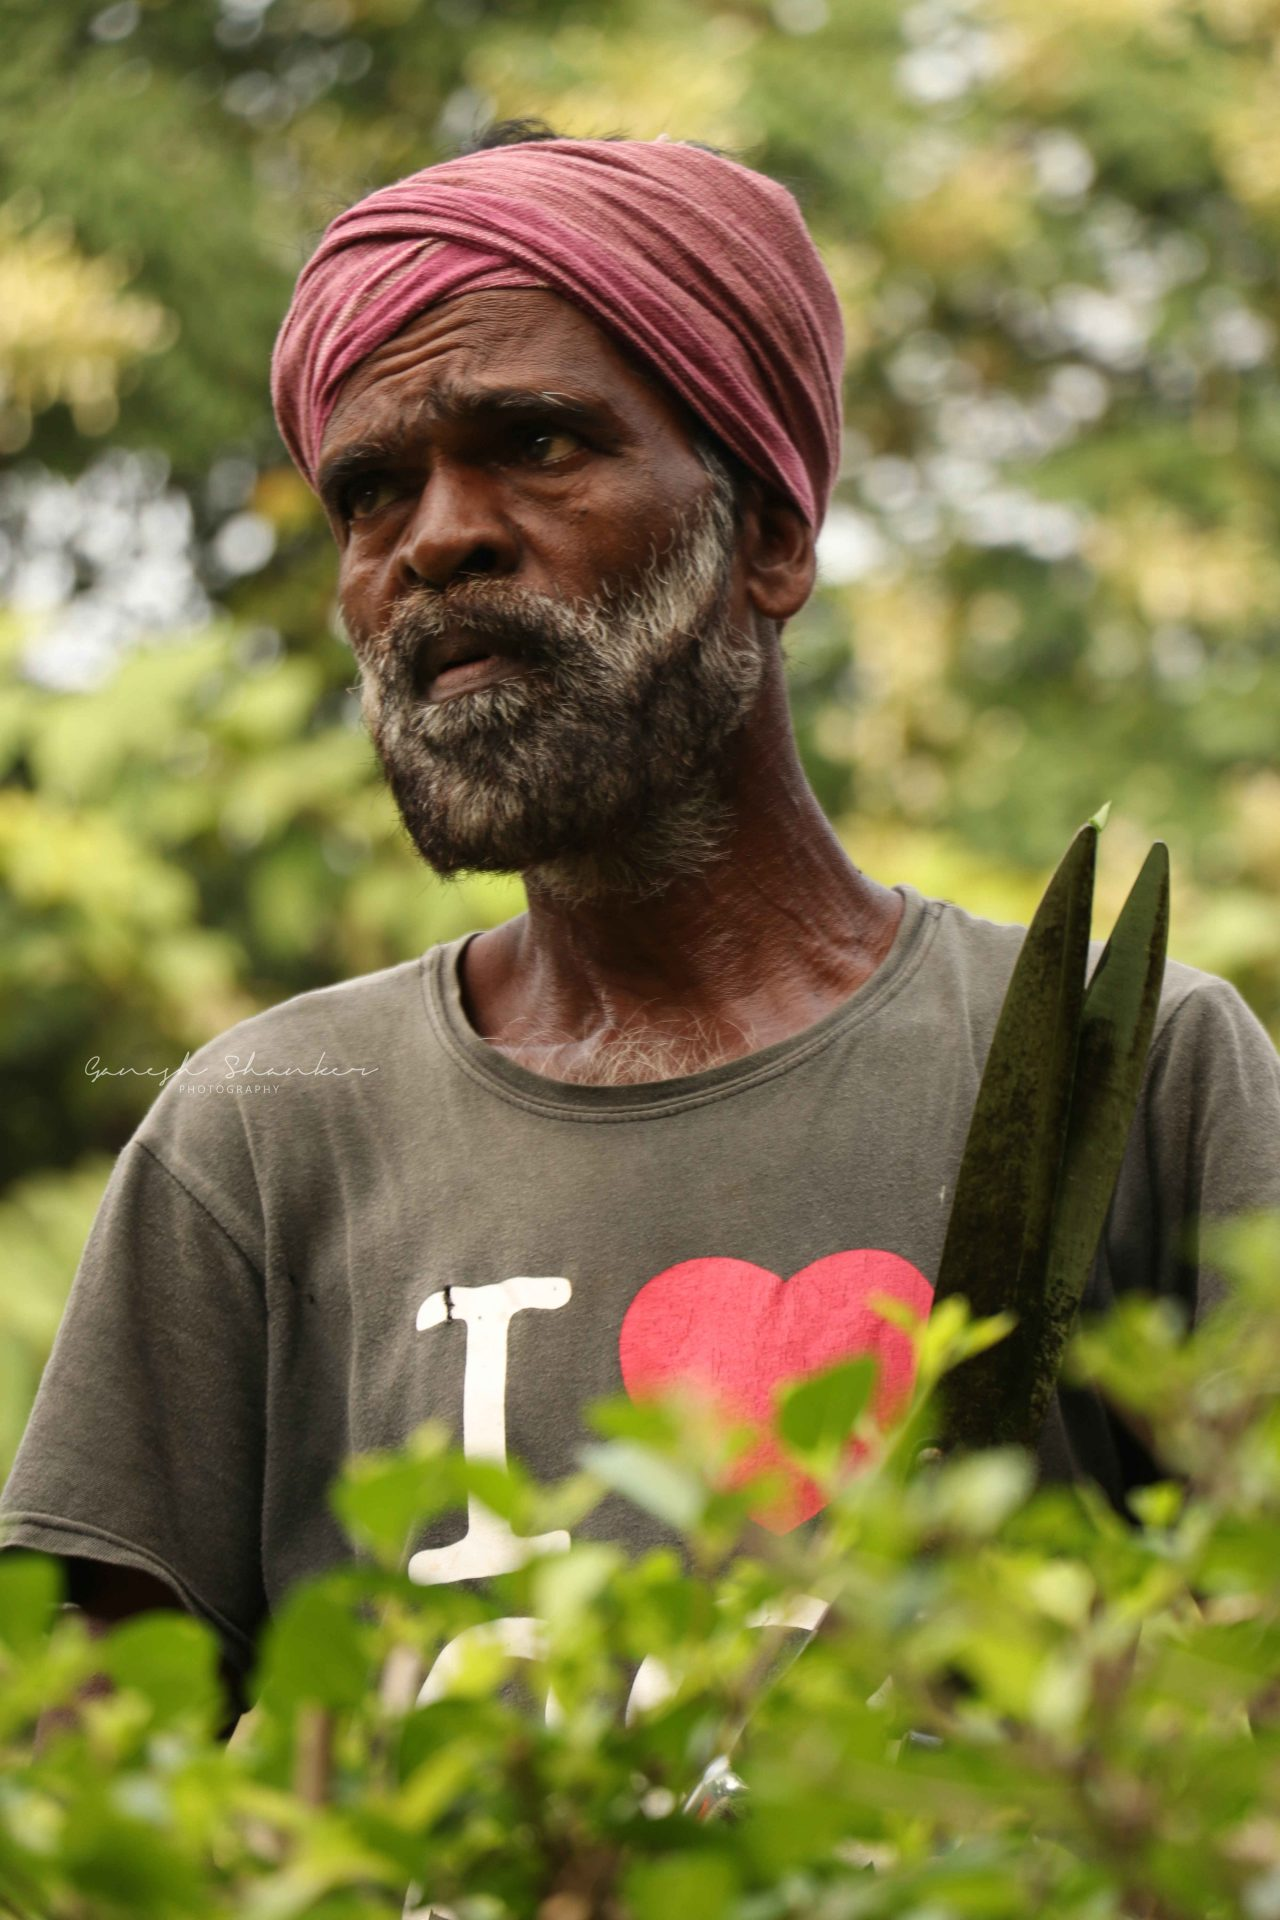 candid-portrait-photography-ganesh-shanker-kk